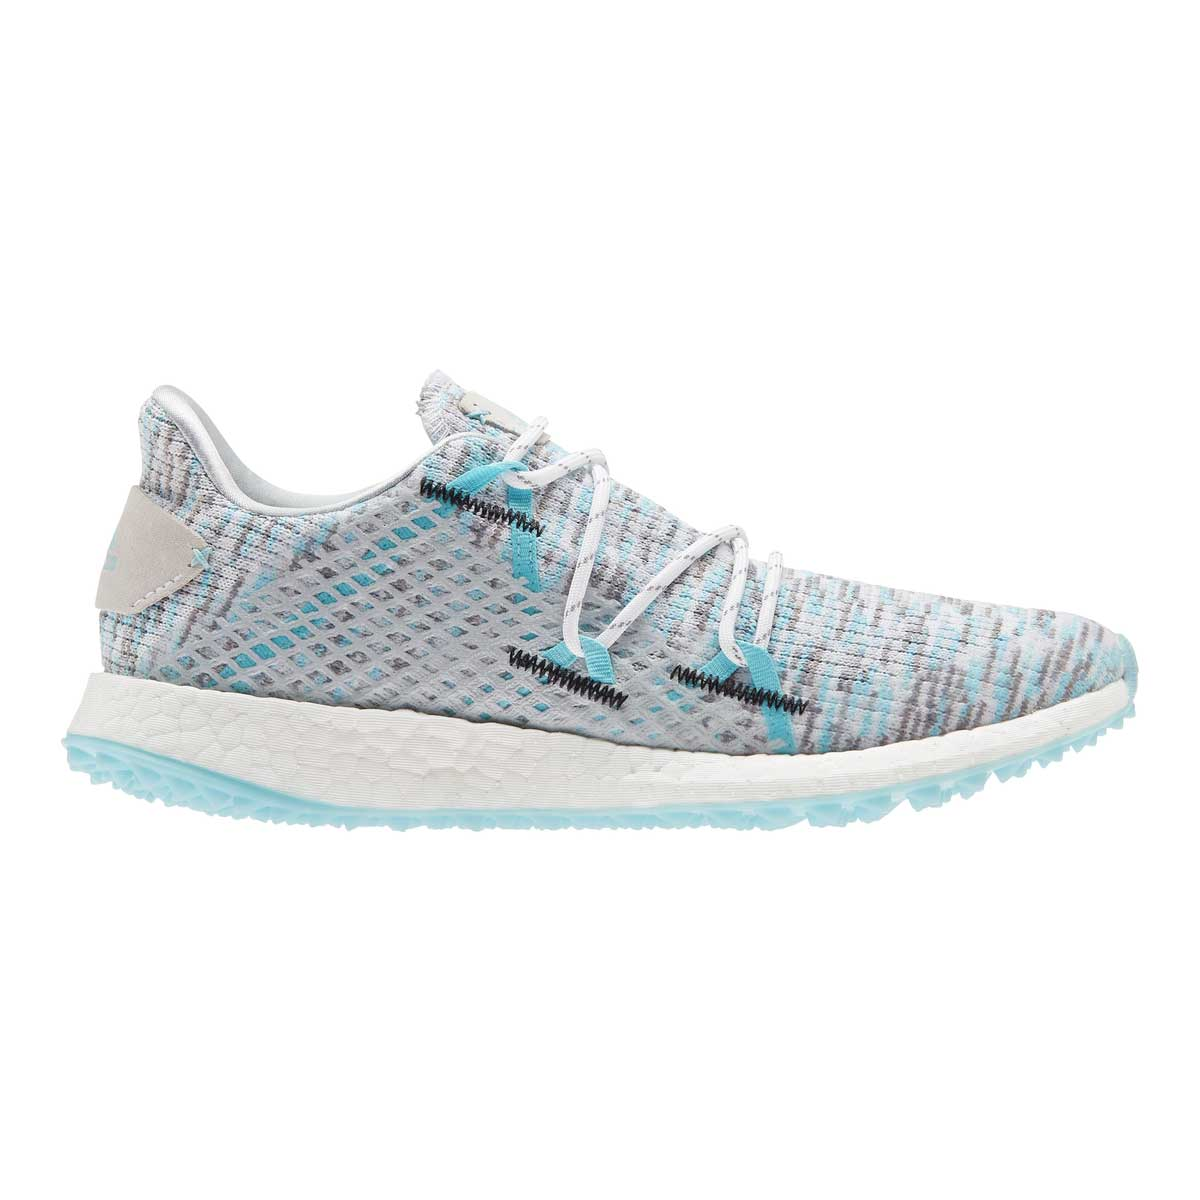 Adidas Women's Crossknit DPR White/Hazy Sky Spikeless Golf Shoe